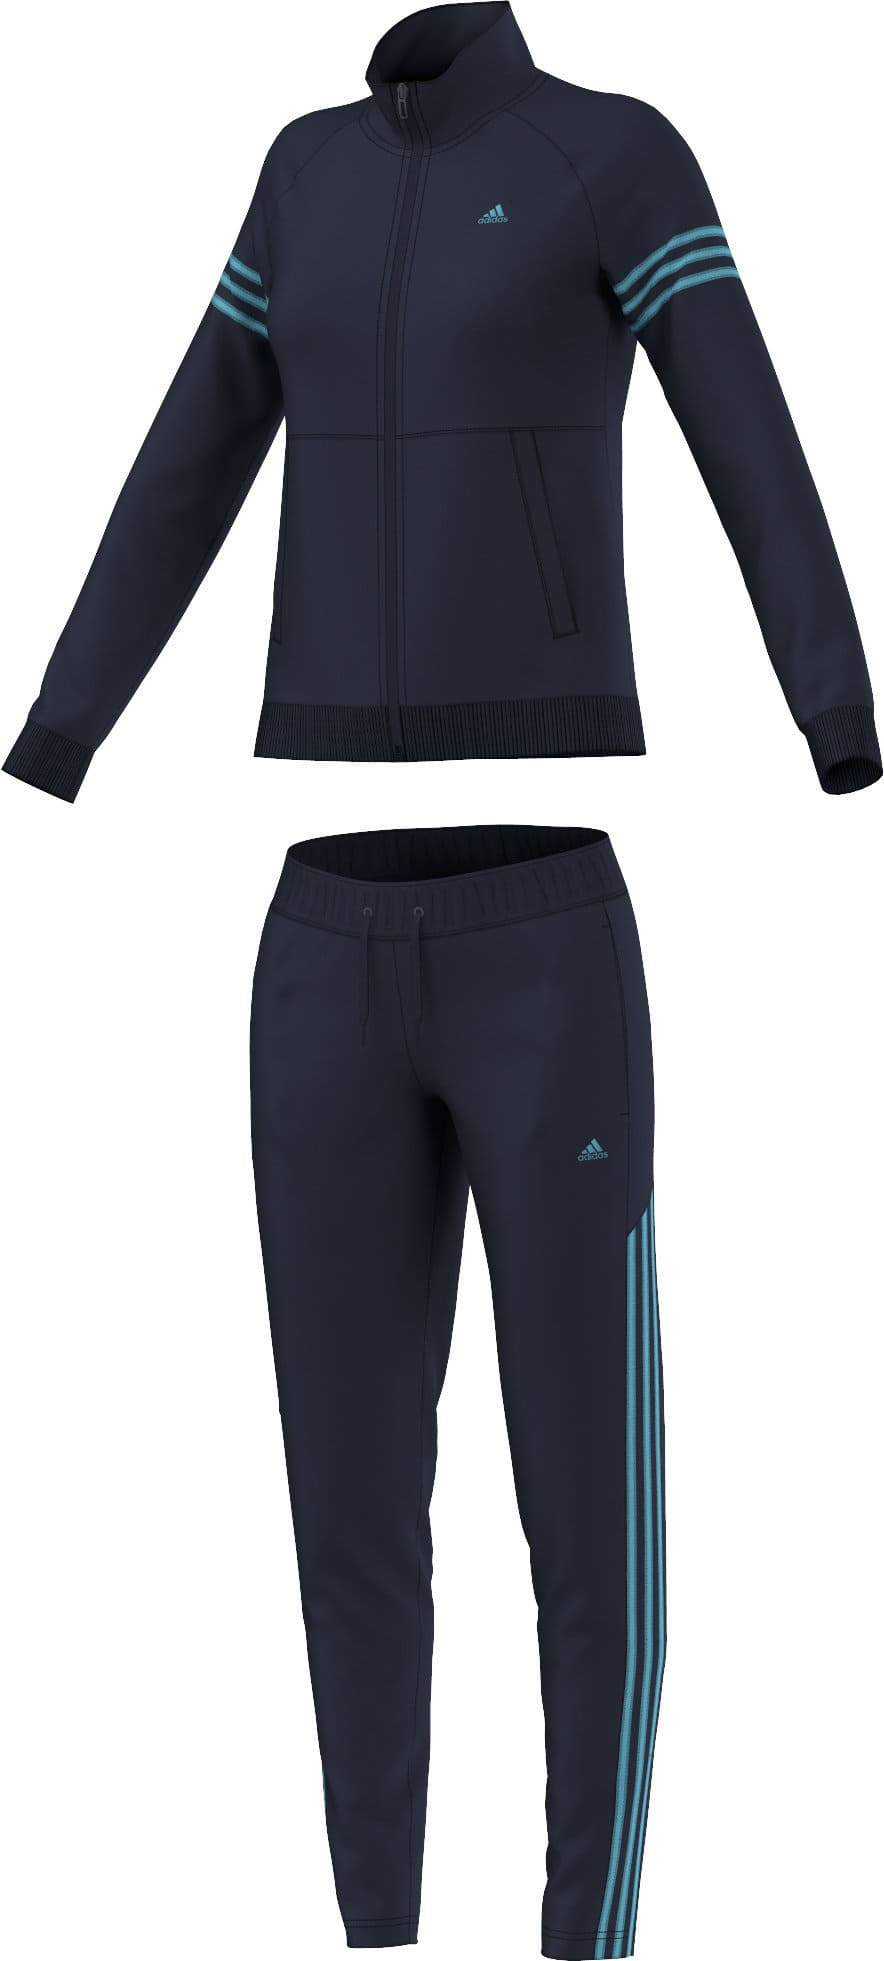 adidas teamsport suit damen trainer migipedia. Black Bedroom Furniture Sets. Home Design Ideas